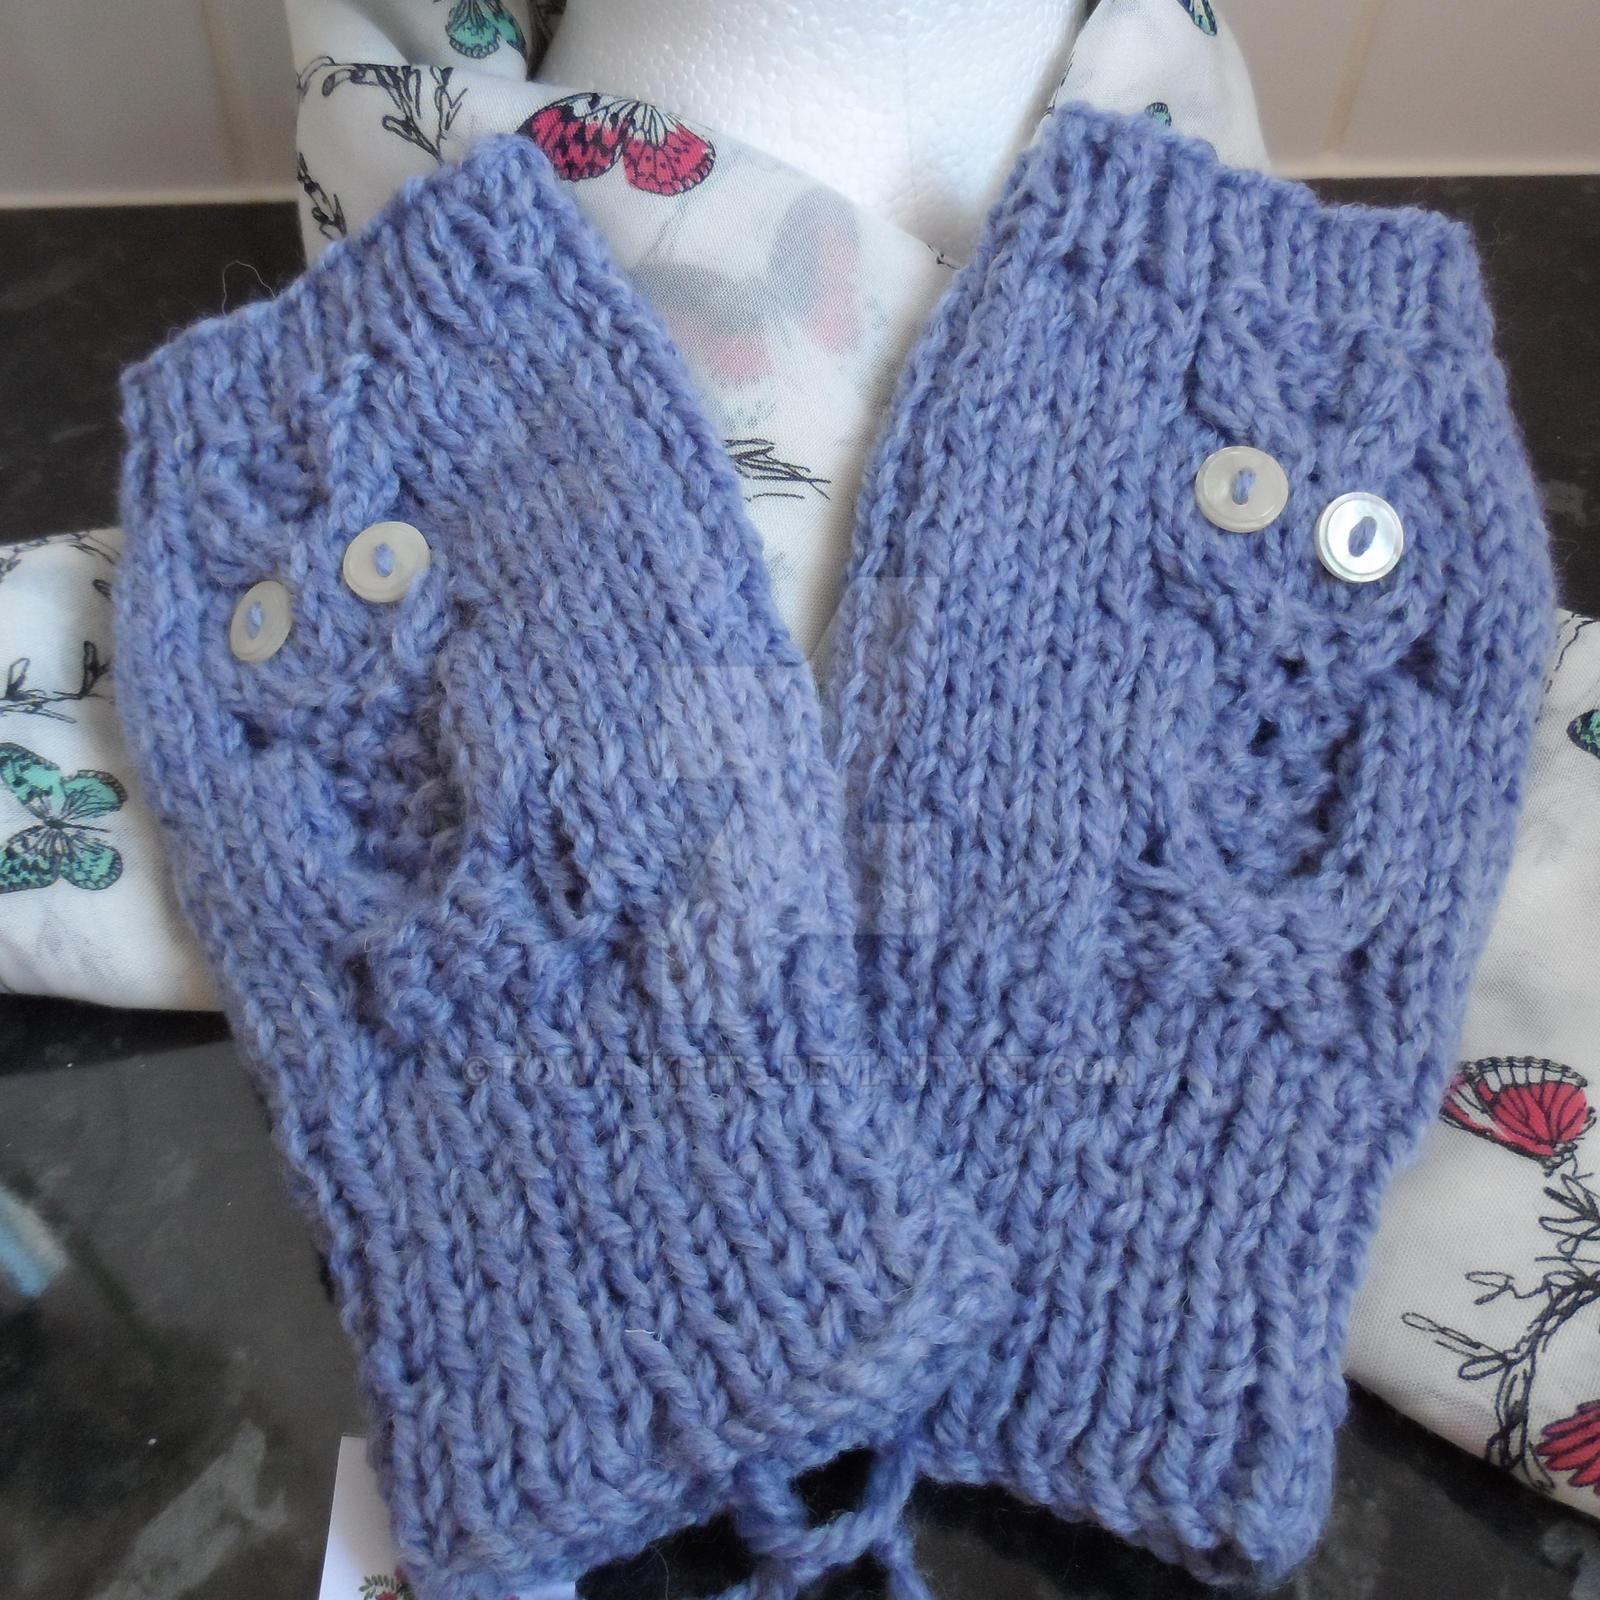 3873419bc Owl by RowanKnits Ladies Fingerless Mitts Gloves. Wrist Warmers. Owl by  RowanKnits